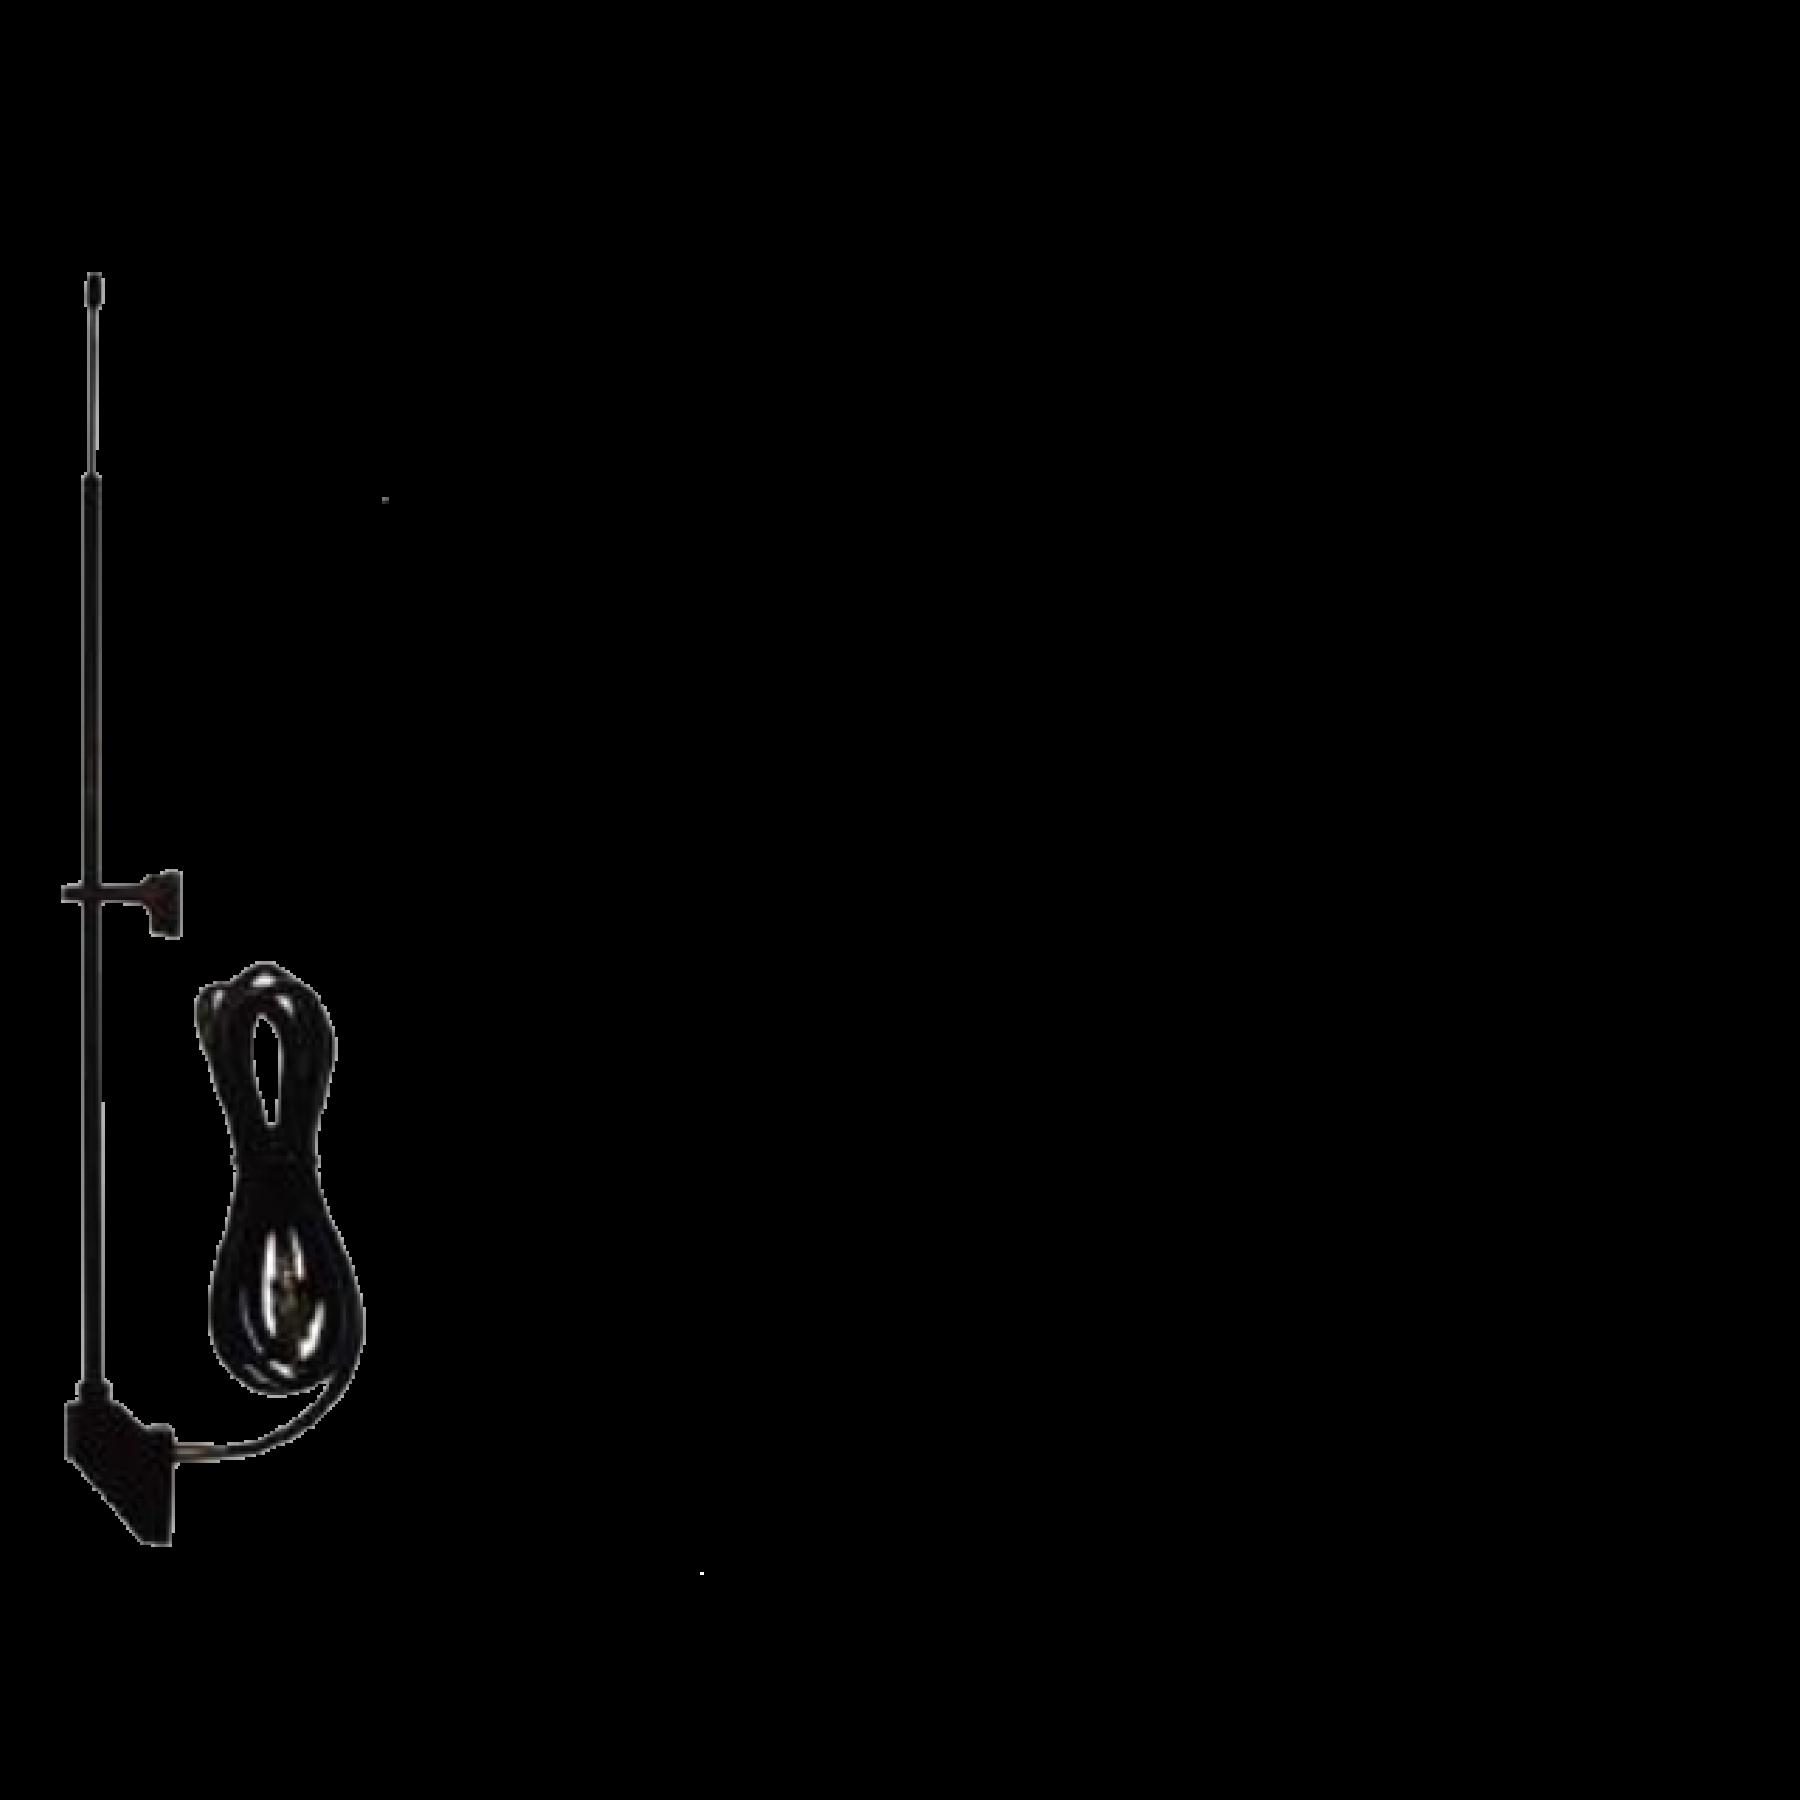 Antenne stijl 08.152010-00